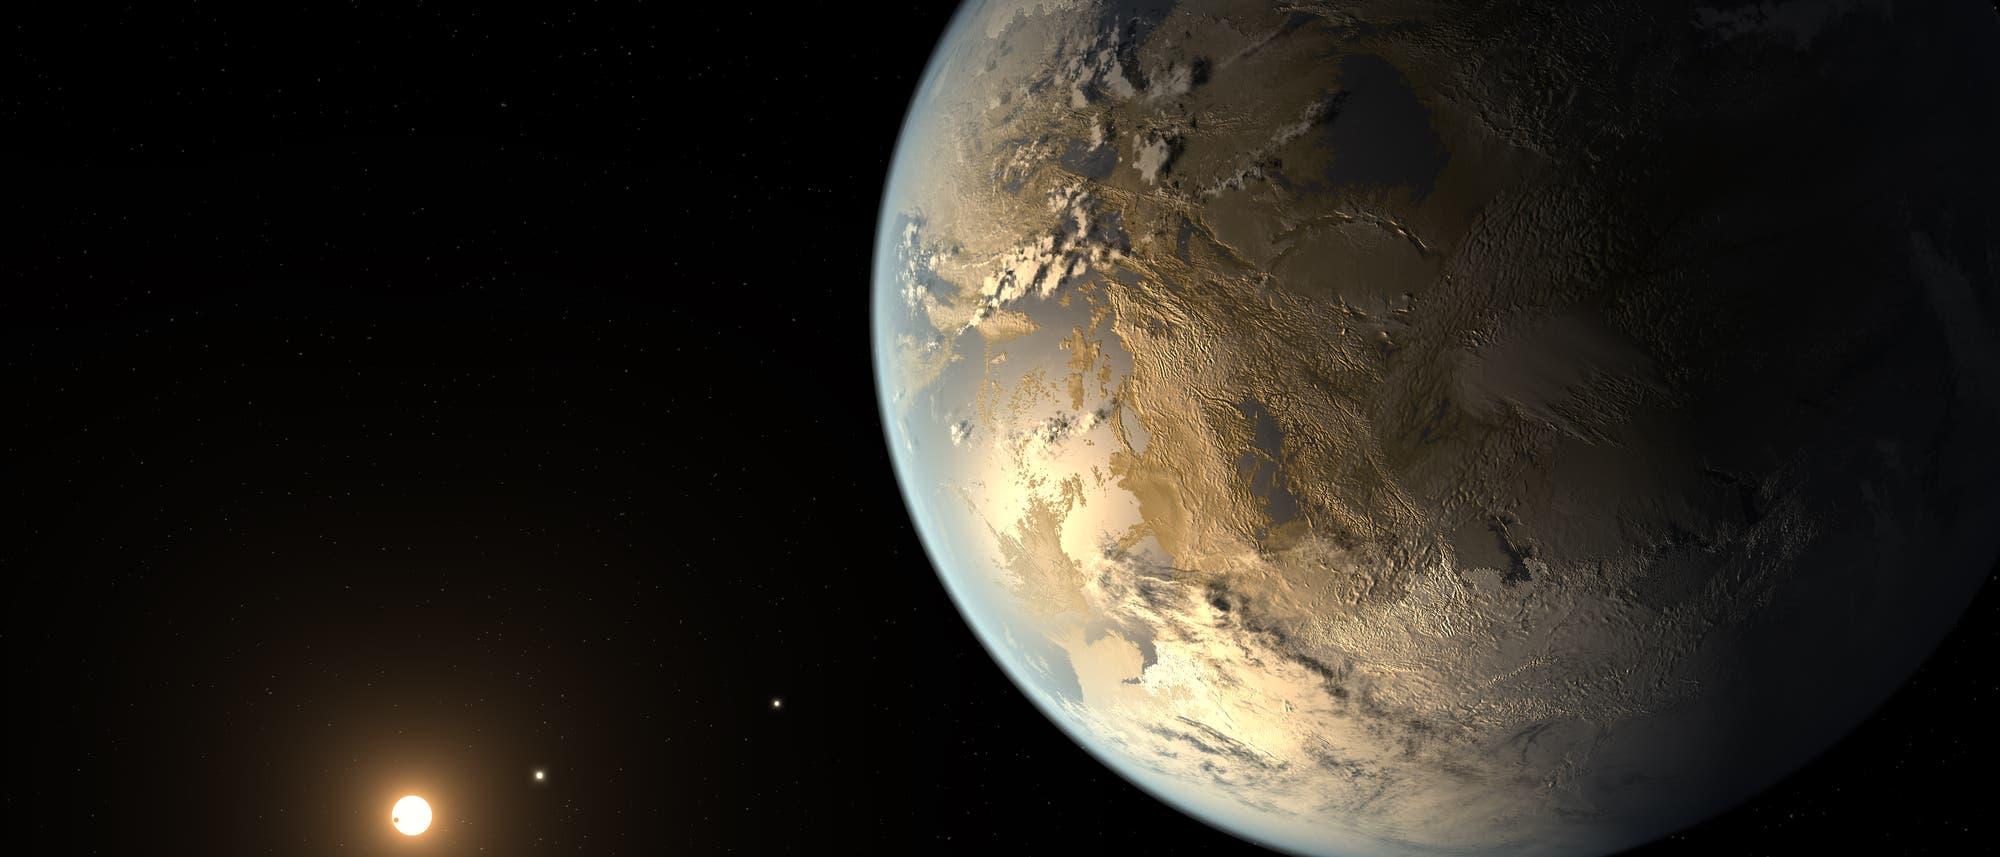 Kepler 186f - Künstlerische Illustration